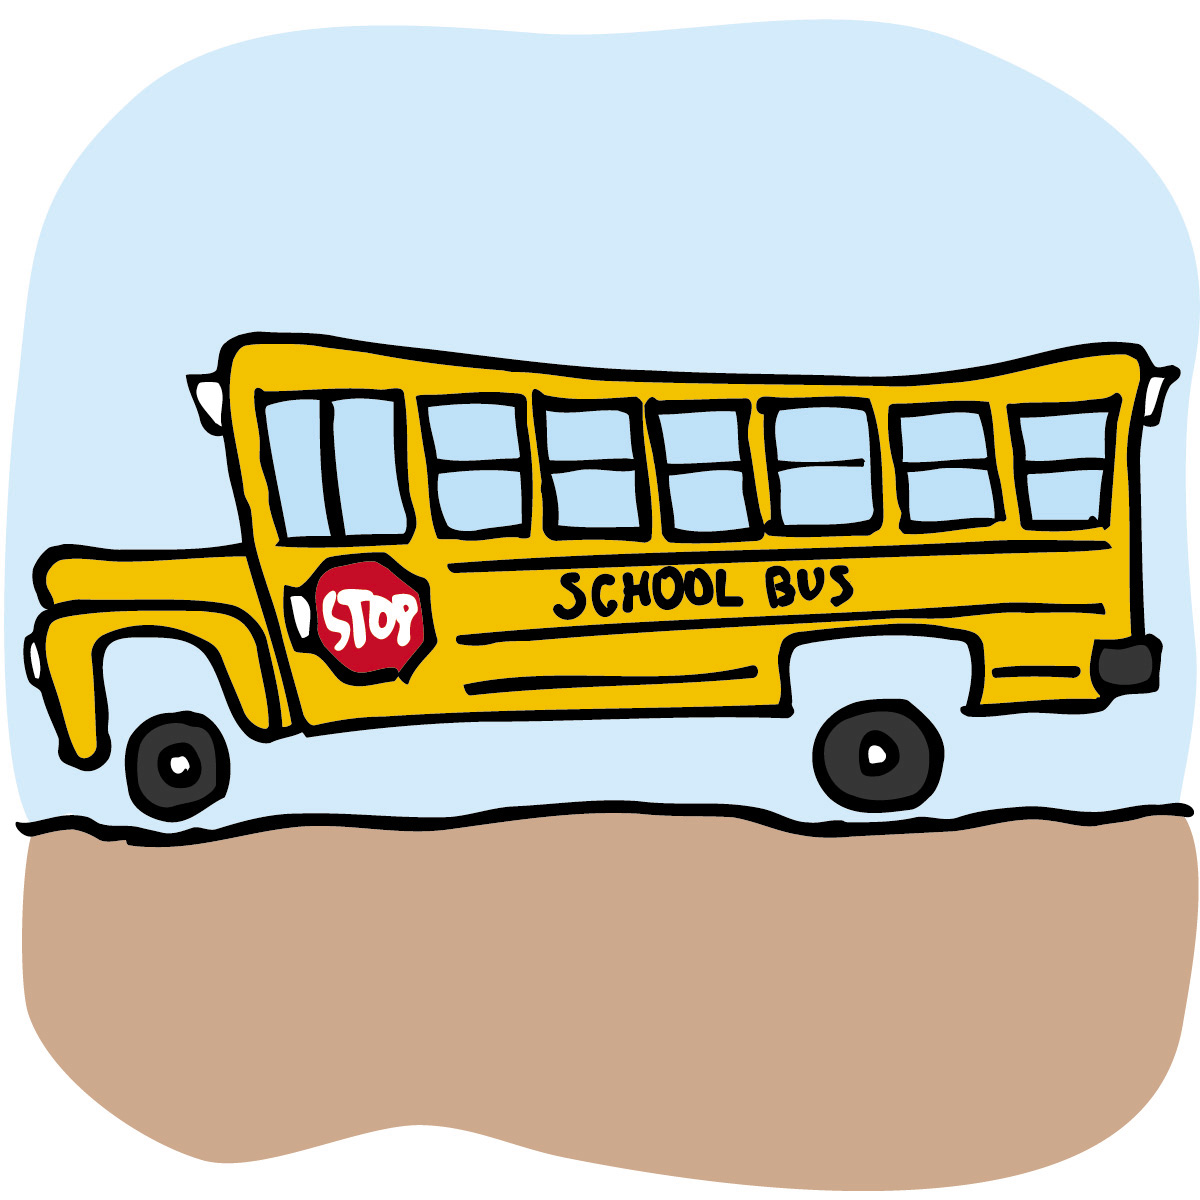 School Bus Stop Clip Art   Clipart Panda - Free Clipart Images